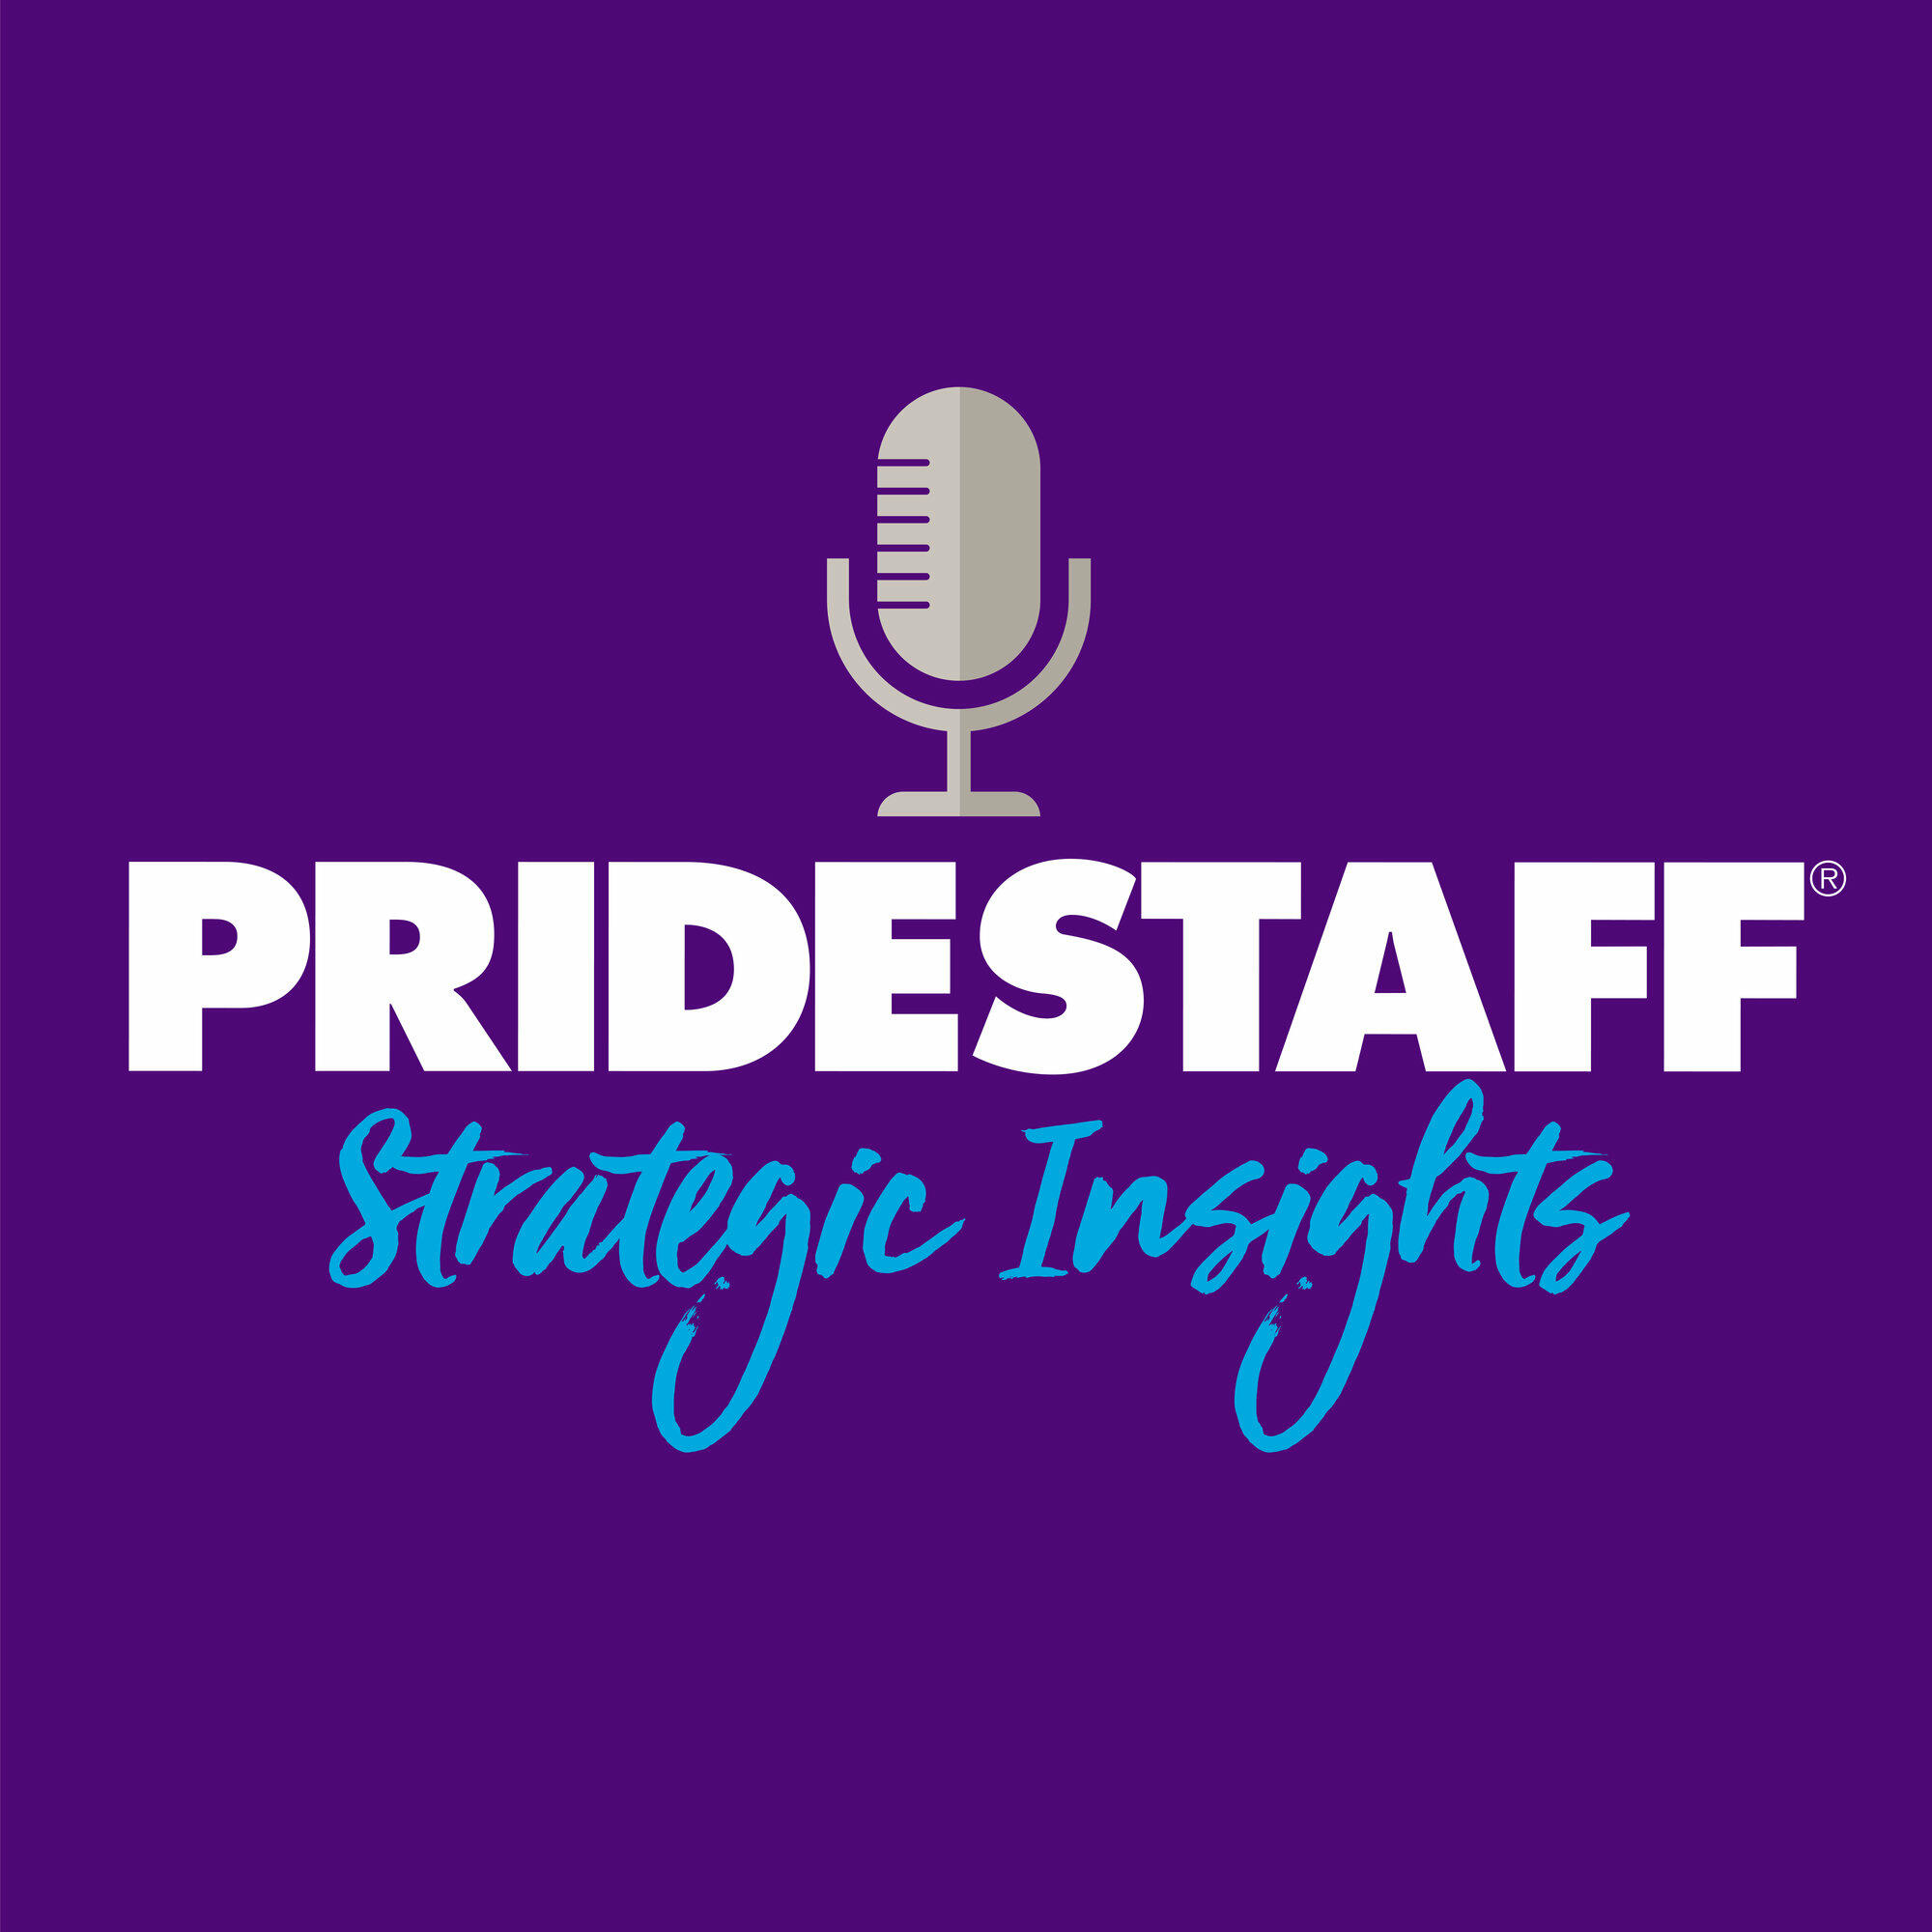 PrideStaff Strategic Insights